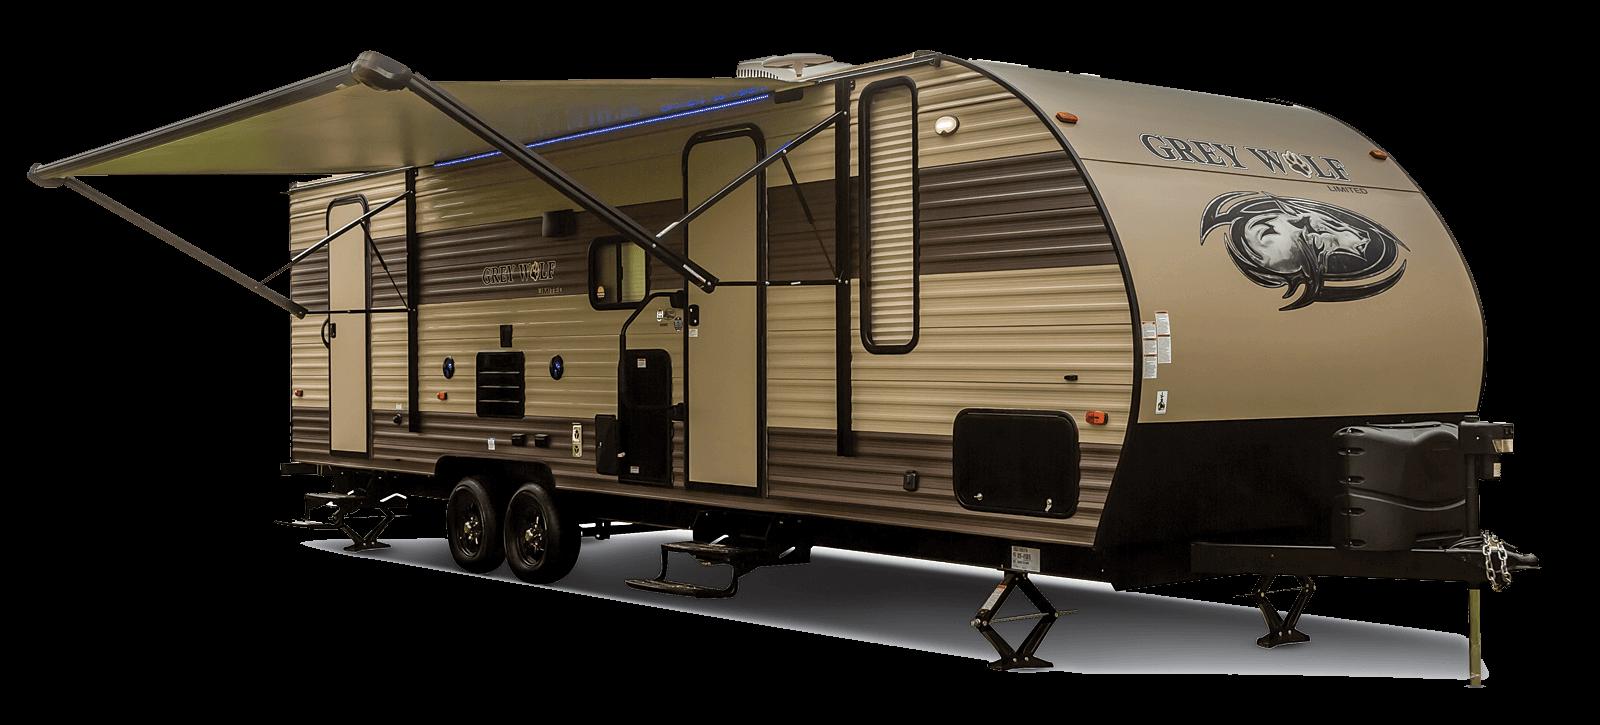 Car hauler trailer clipart jpg royalty free Tours | Carolina Coach & Marine | Claremont North Carolina jpg royalty free